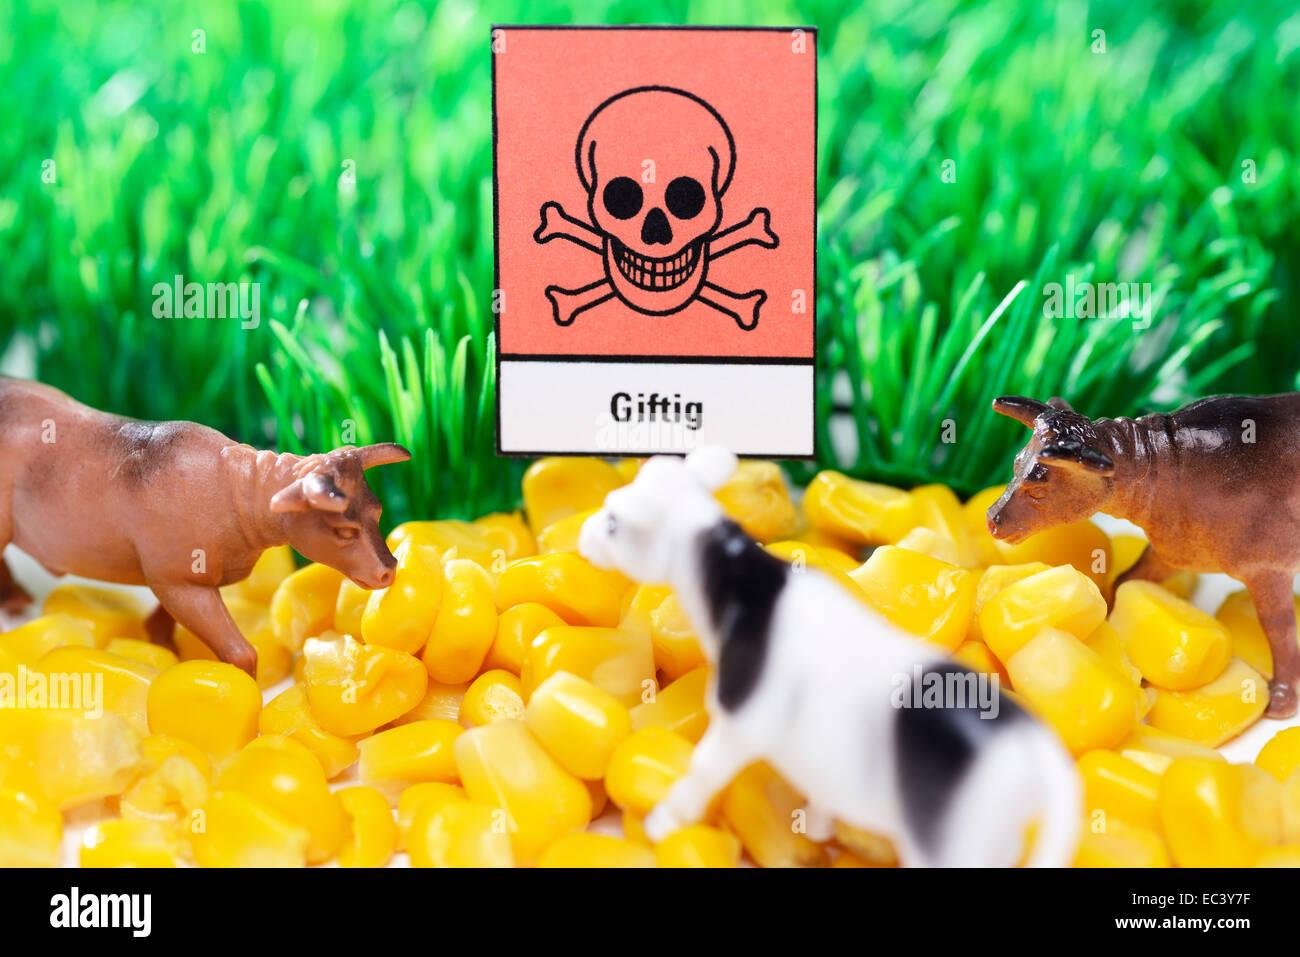 Corn and poison warning sign, contaminated animal feedstuffs - Stock Image